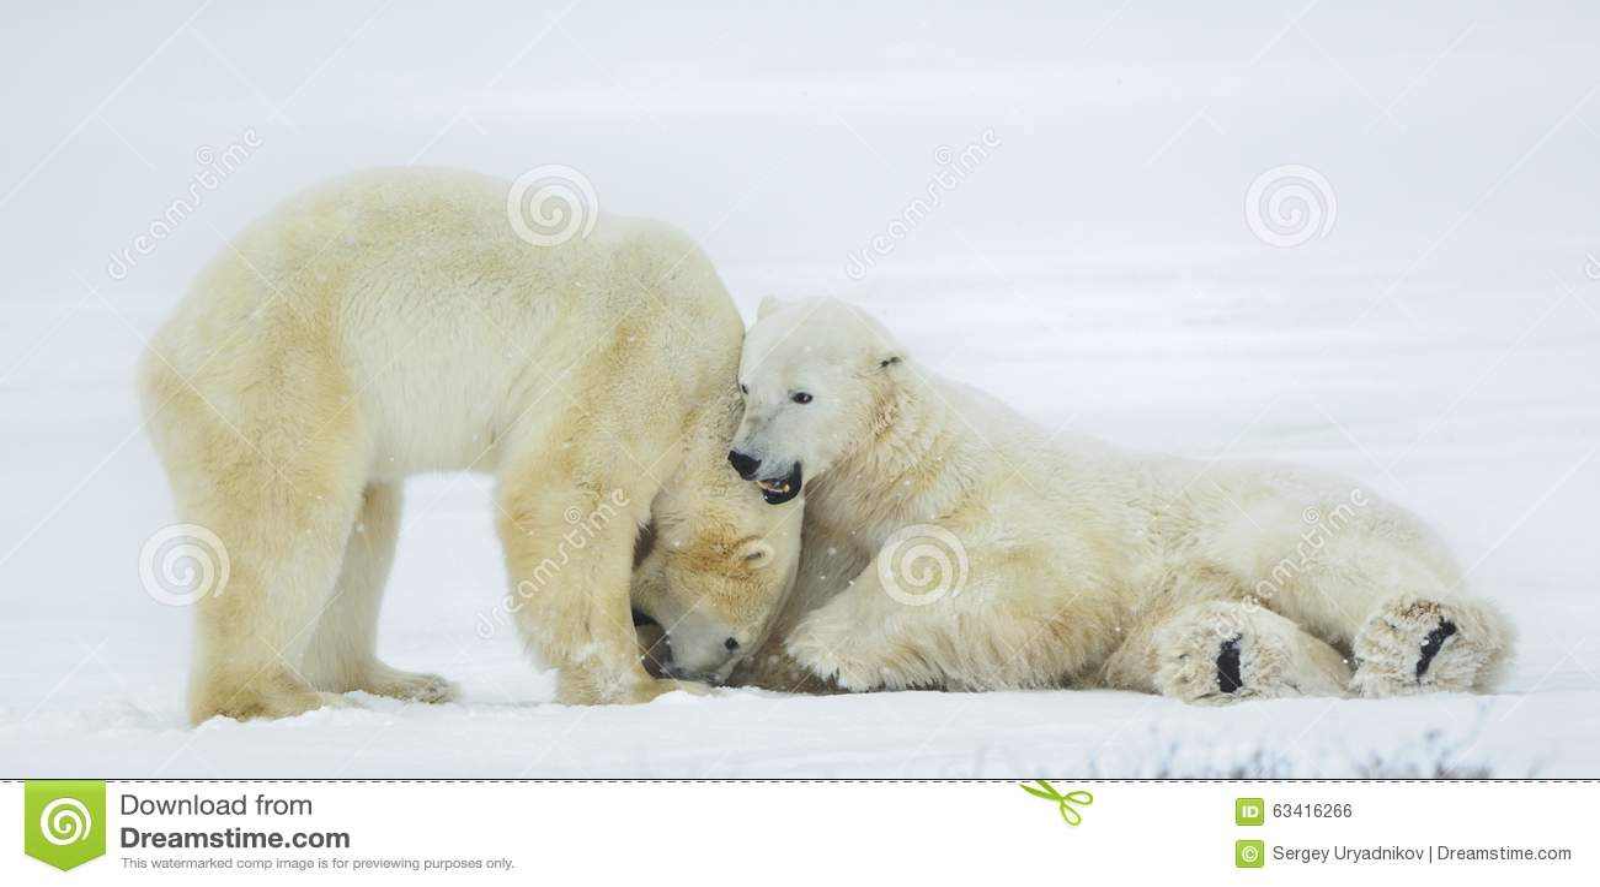 Fighting Polar bears (Ursus maritimus ) on the snow.